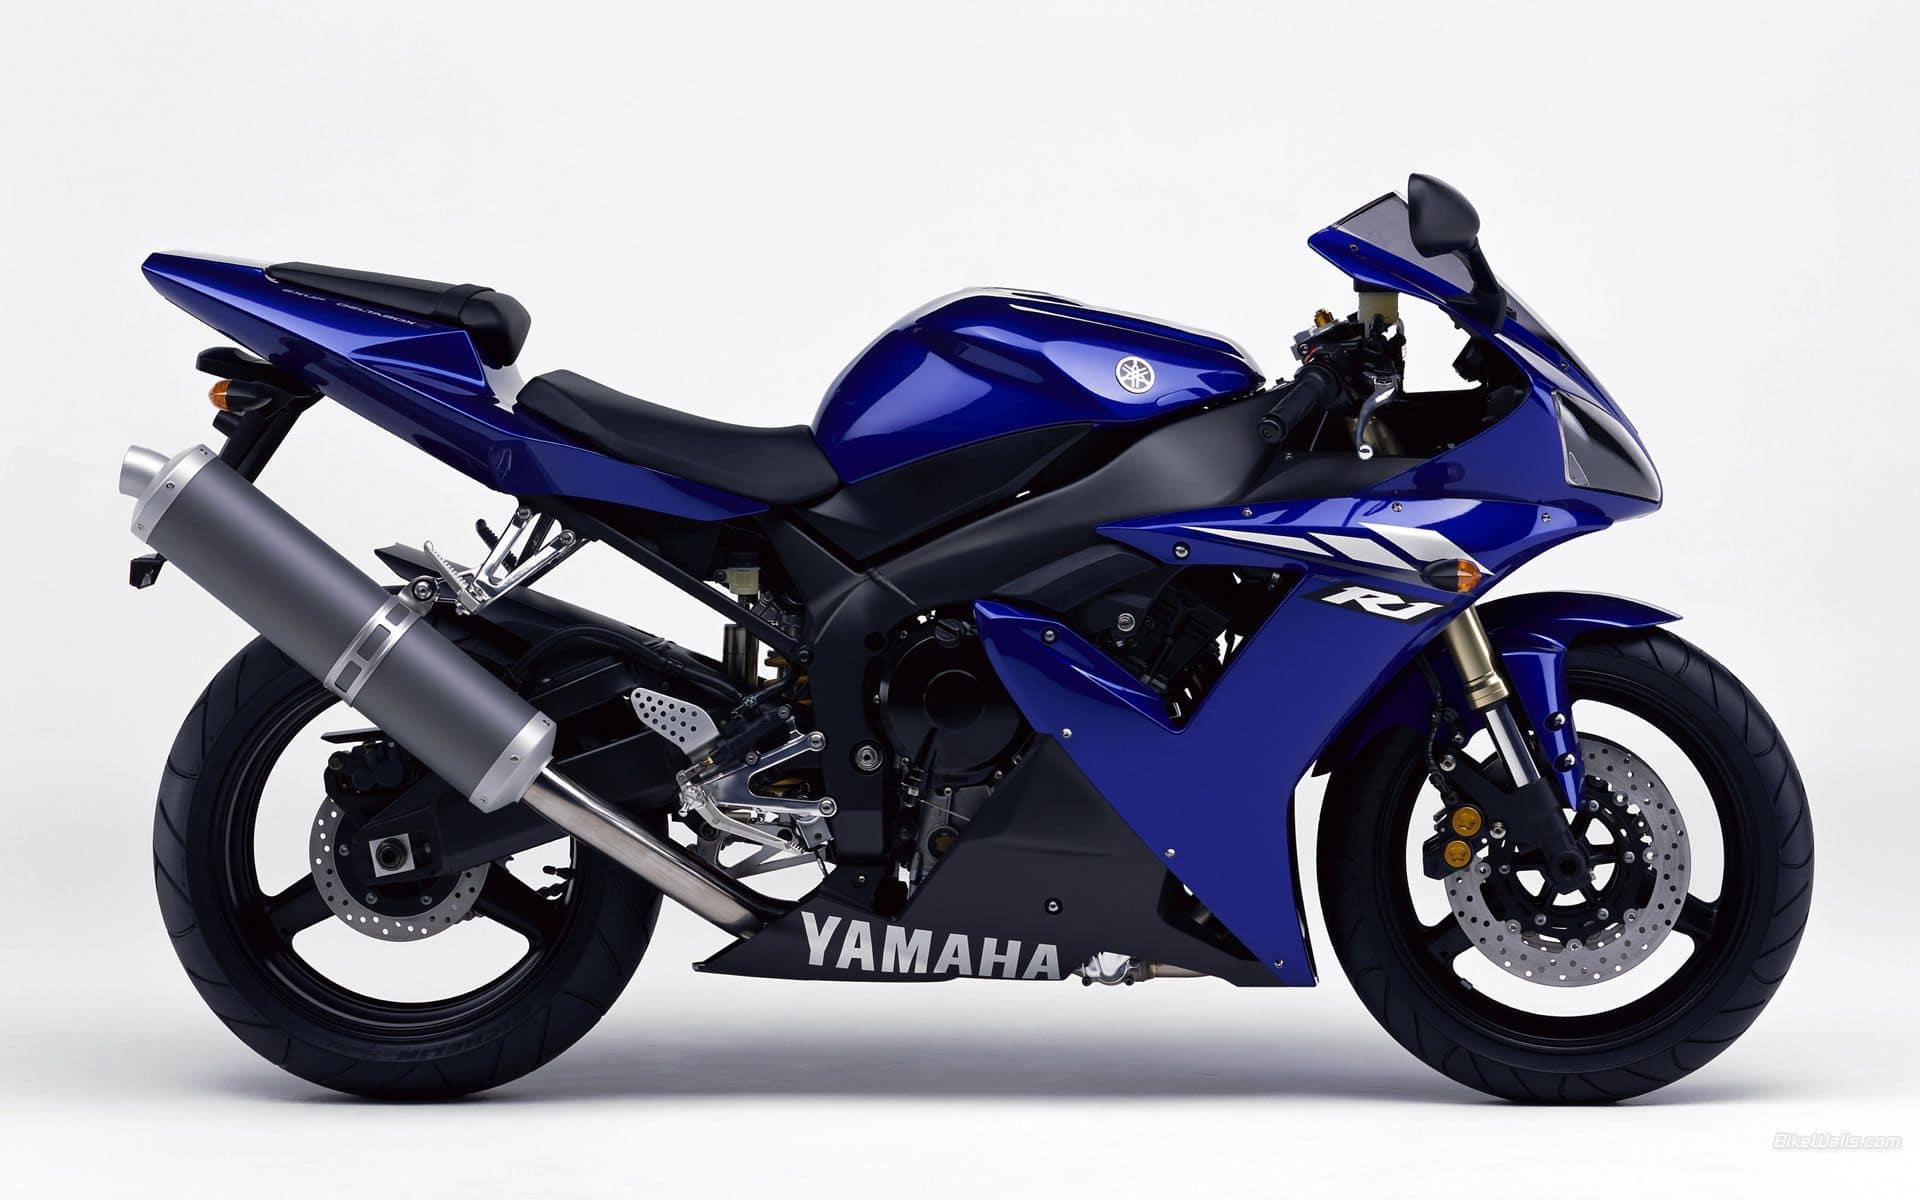 Yamaha R1 Buyer's Guide: How to Buy a Used Yamaha R1